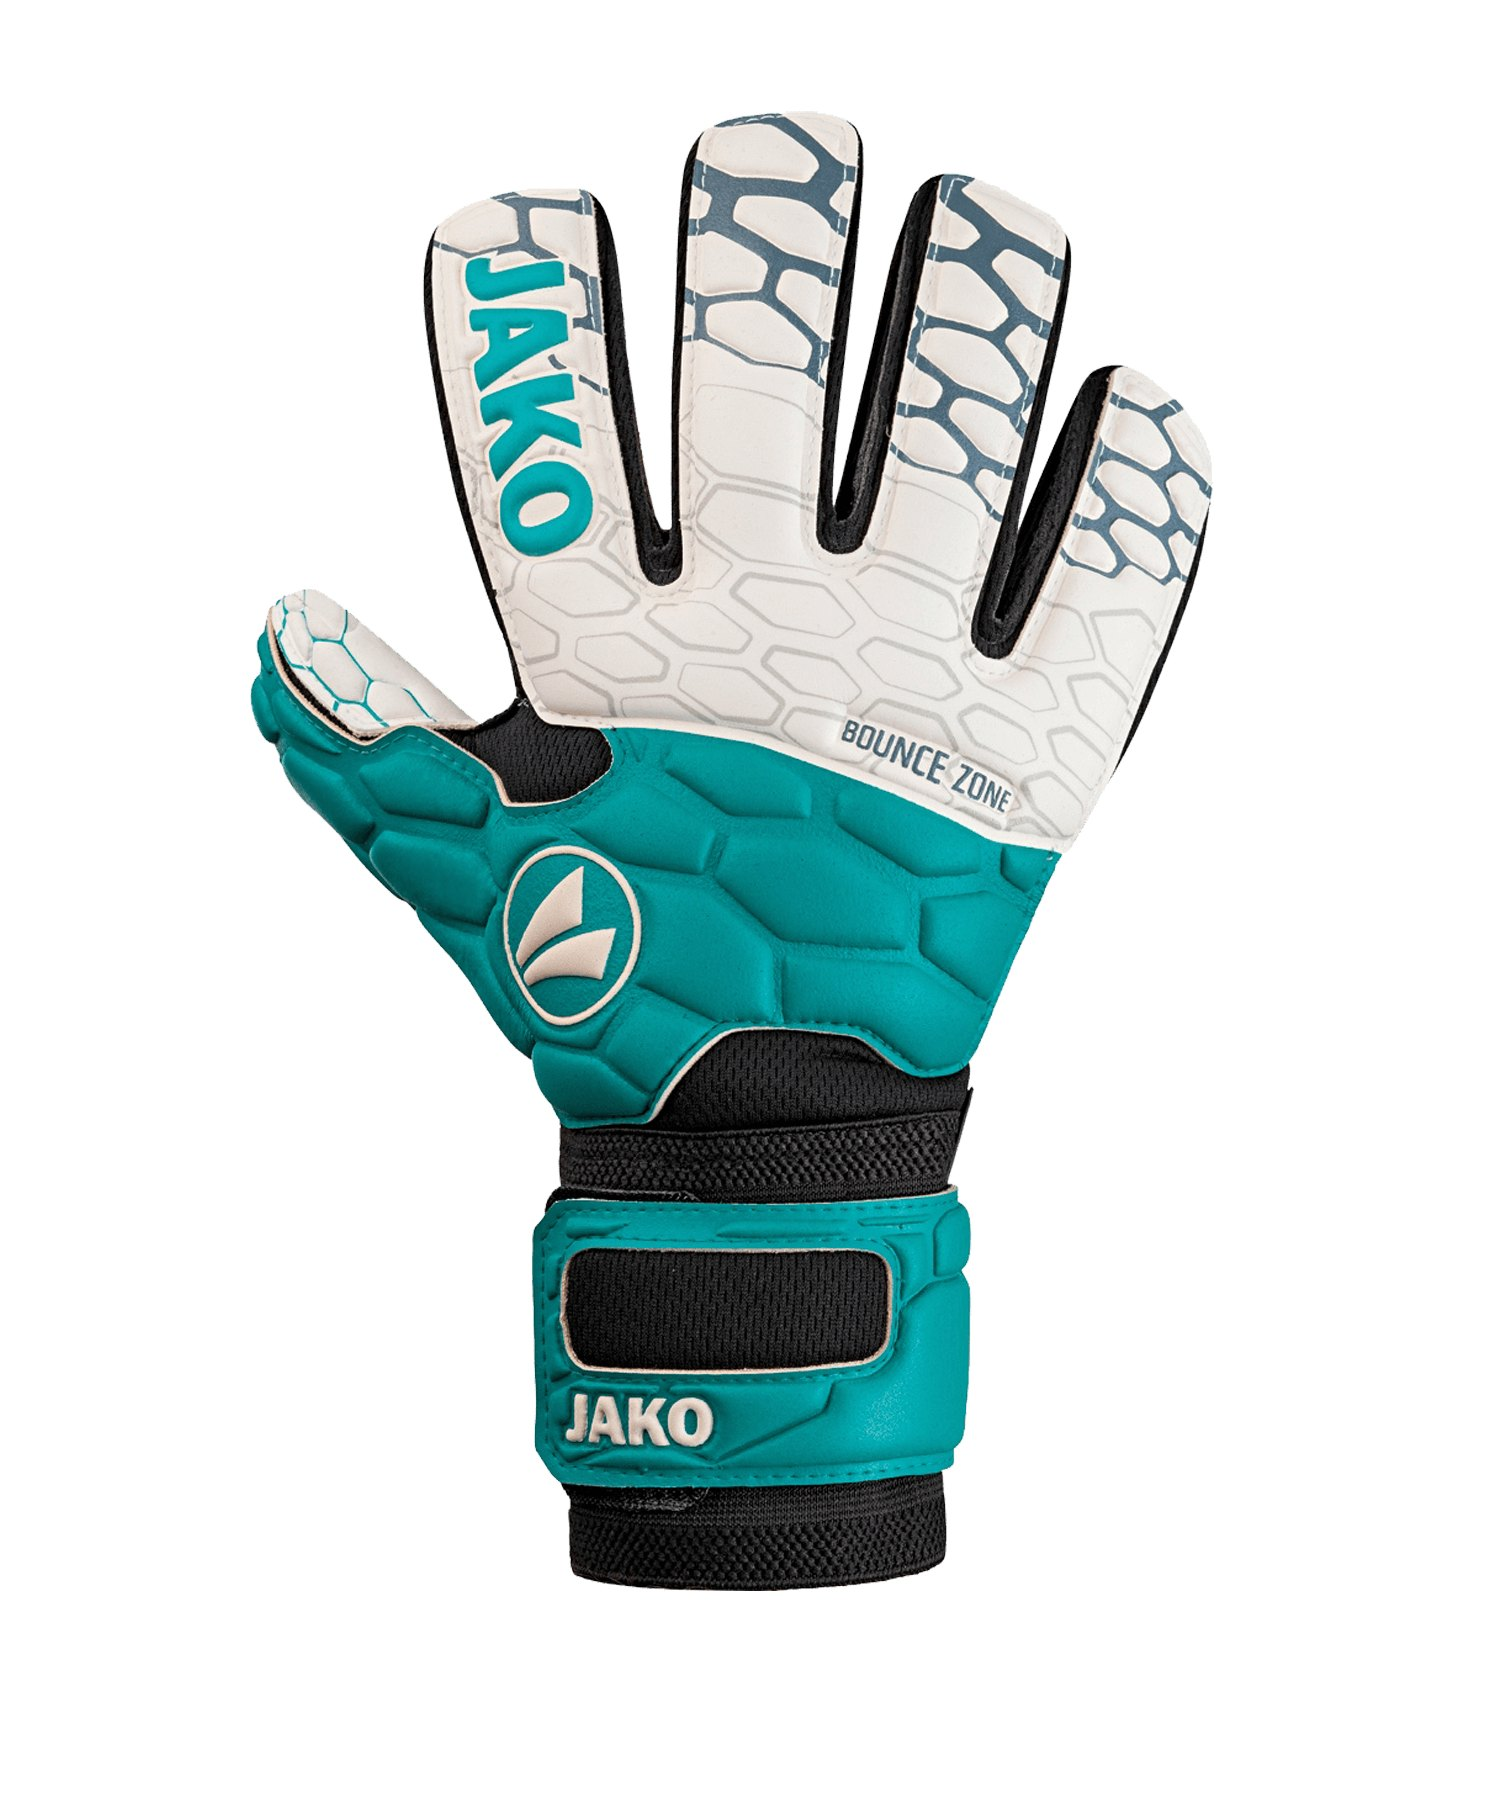 JAKO TW-Handschuh Prestige SuperSoft RC Türkis F24 - blau